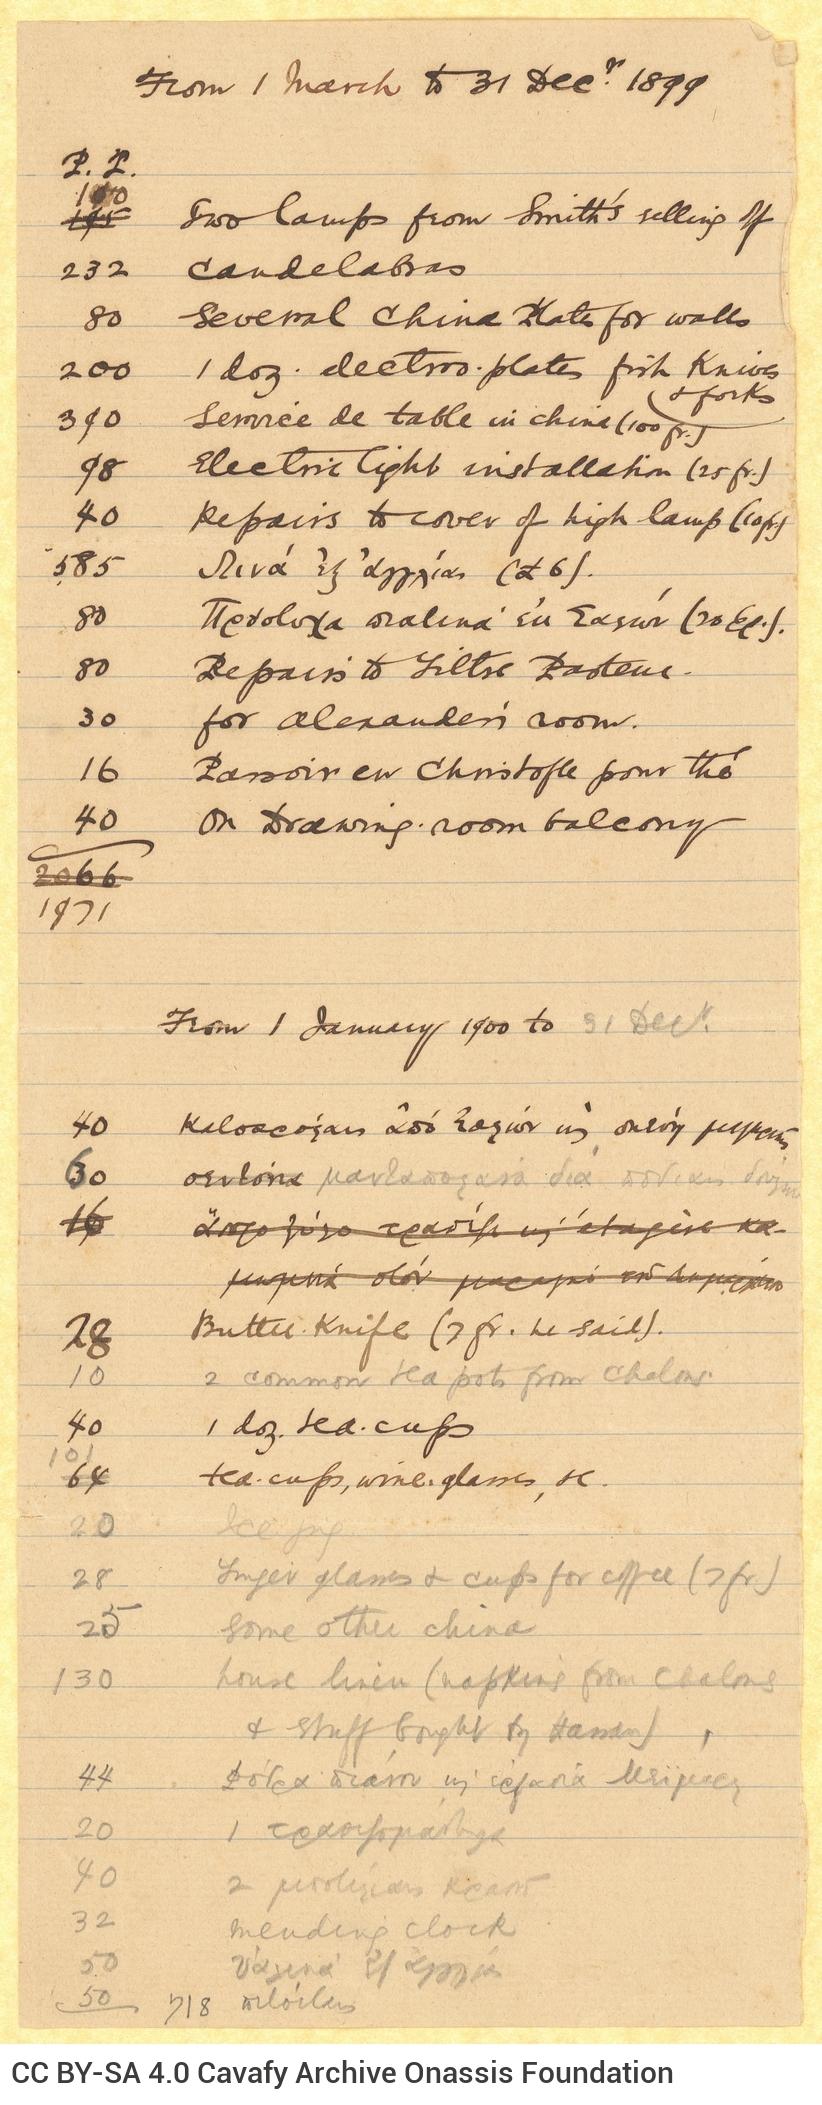 Handwritten list of household items (lamps, crockery, cooking utensils, fabrics, etc.) on one side of a sheet, cut in half